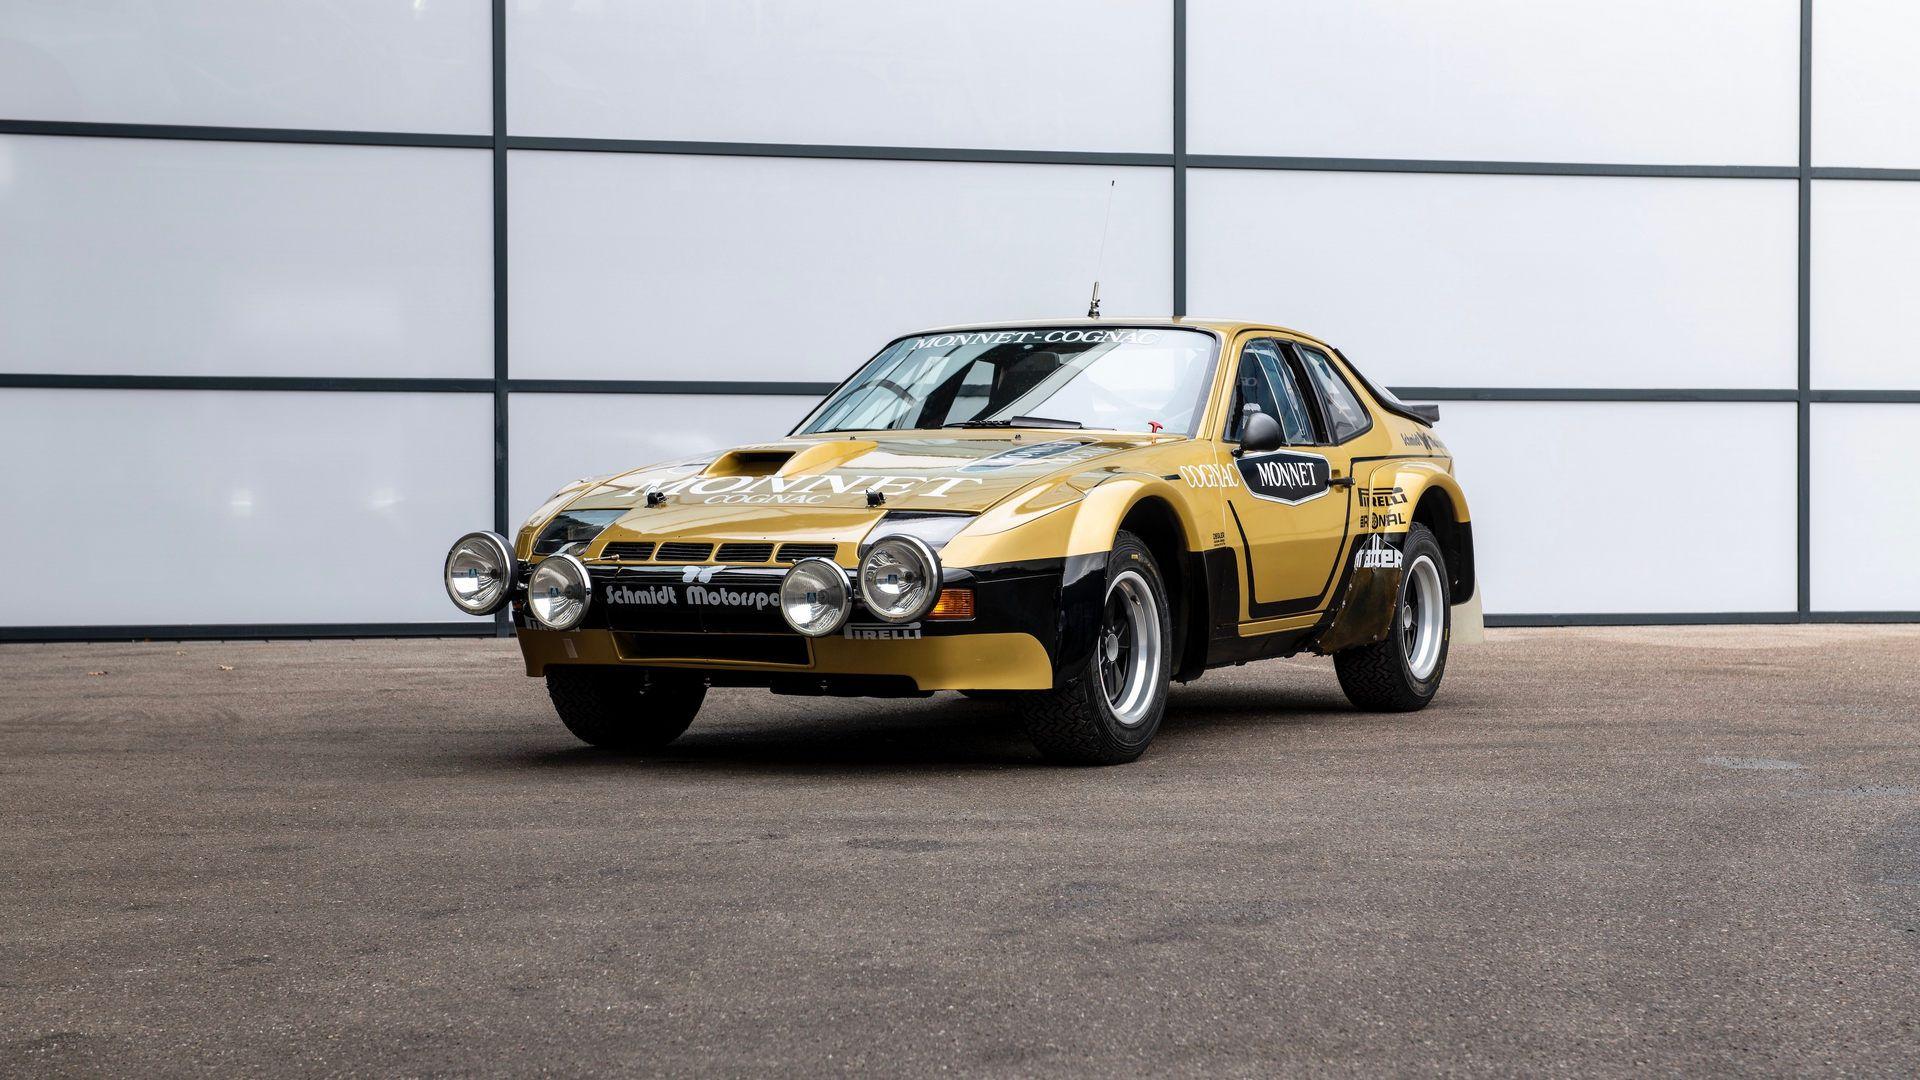 Porsche-924-Carrera-GTS-rally-car-Walter-Rohrl-6